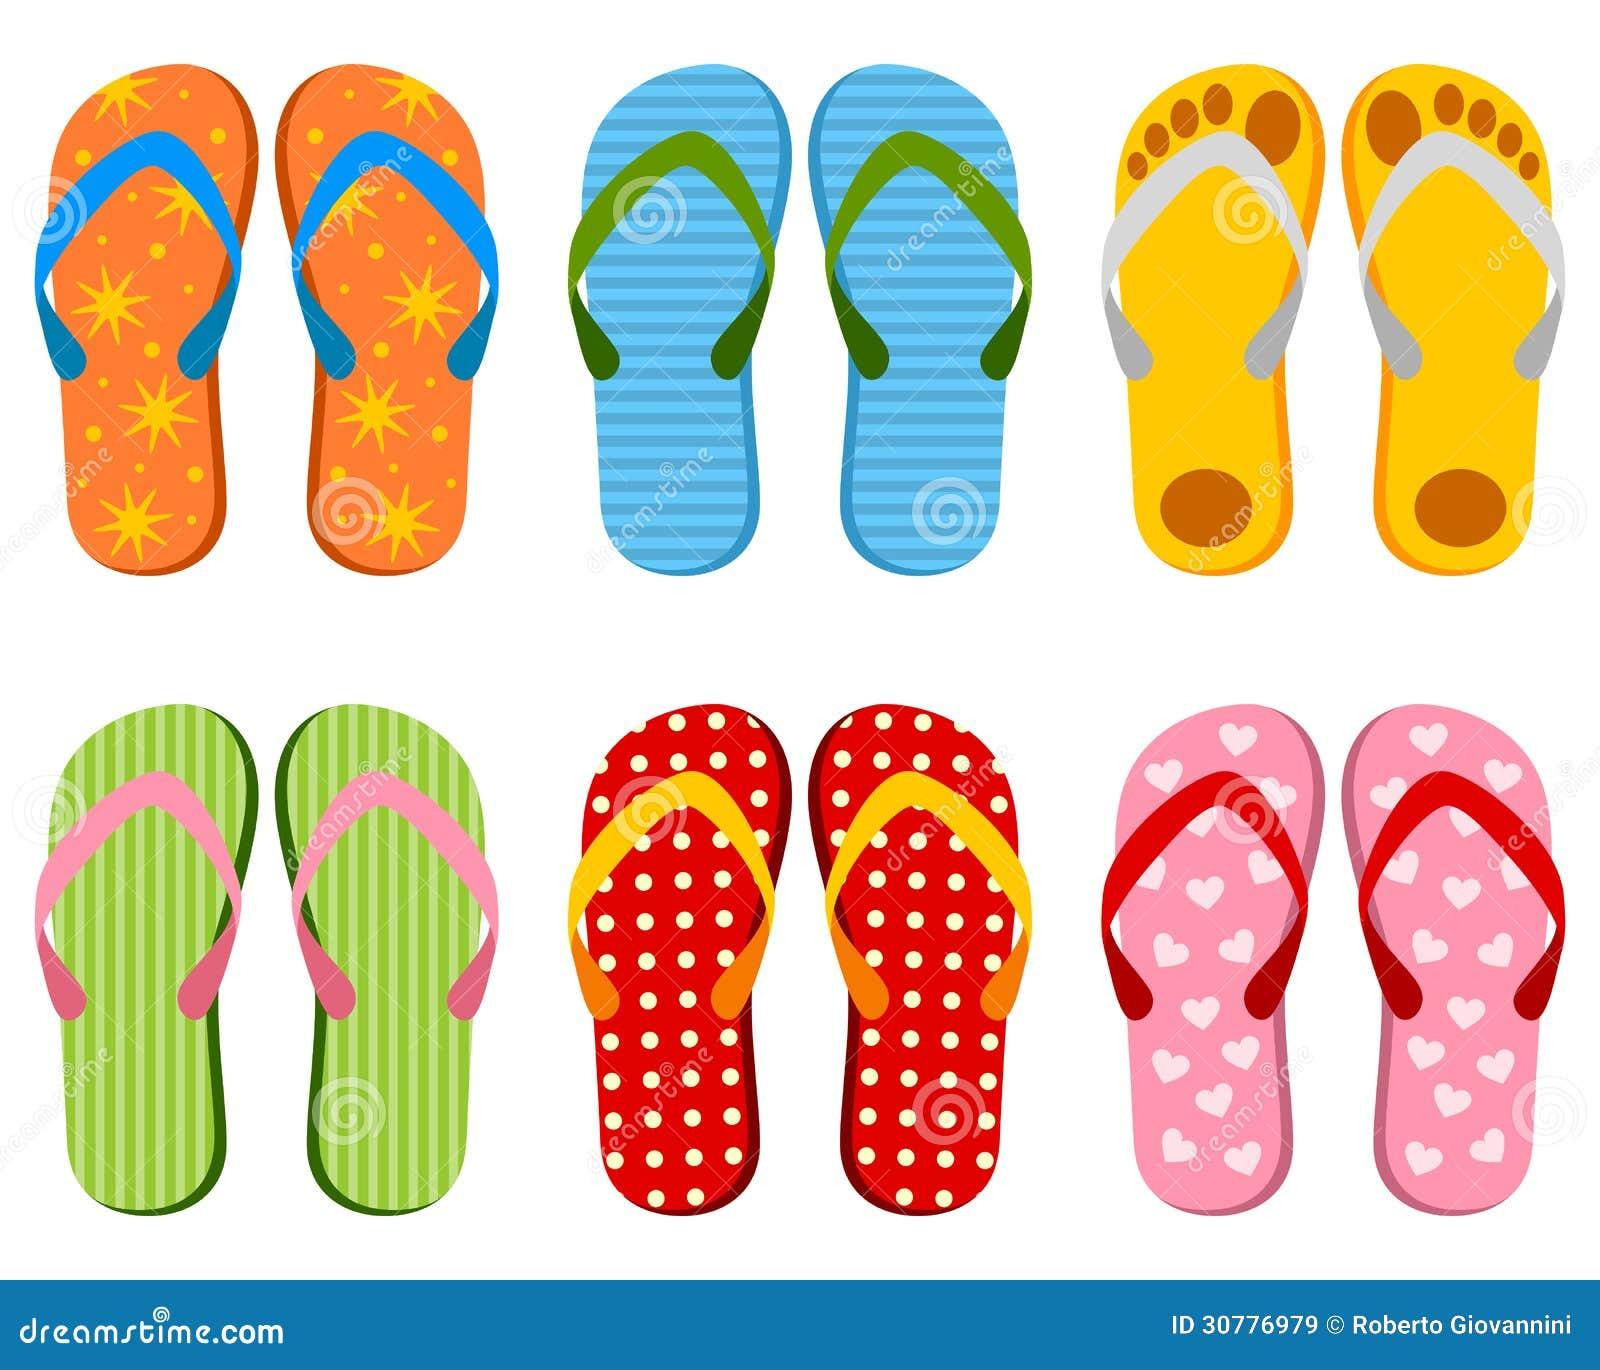 706af96e246 Colorful Flip Flops Collection Stock Vector - Illustration of shoes ...